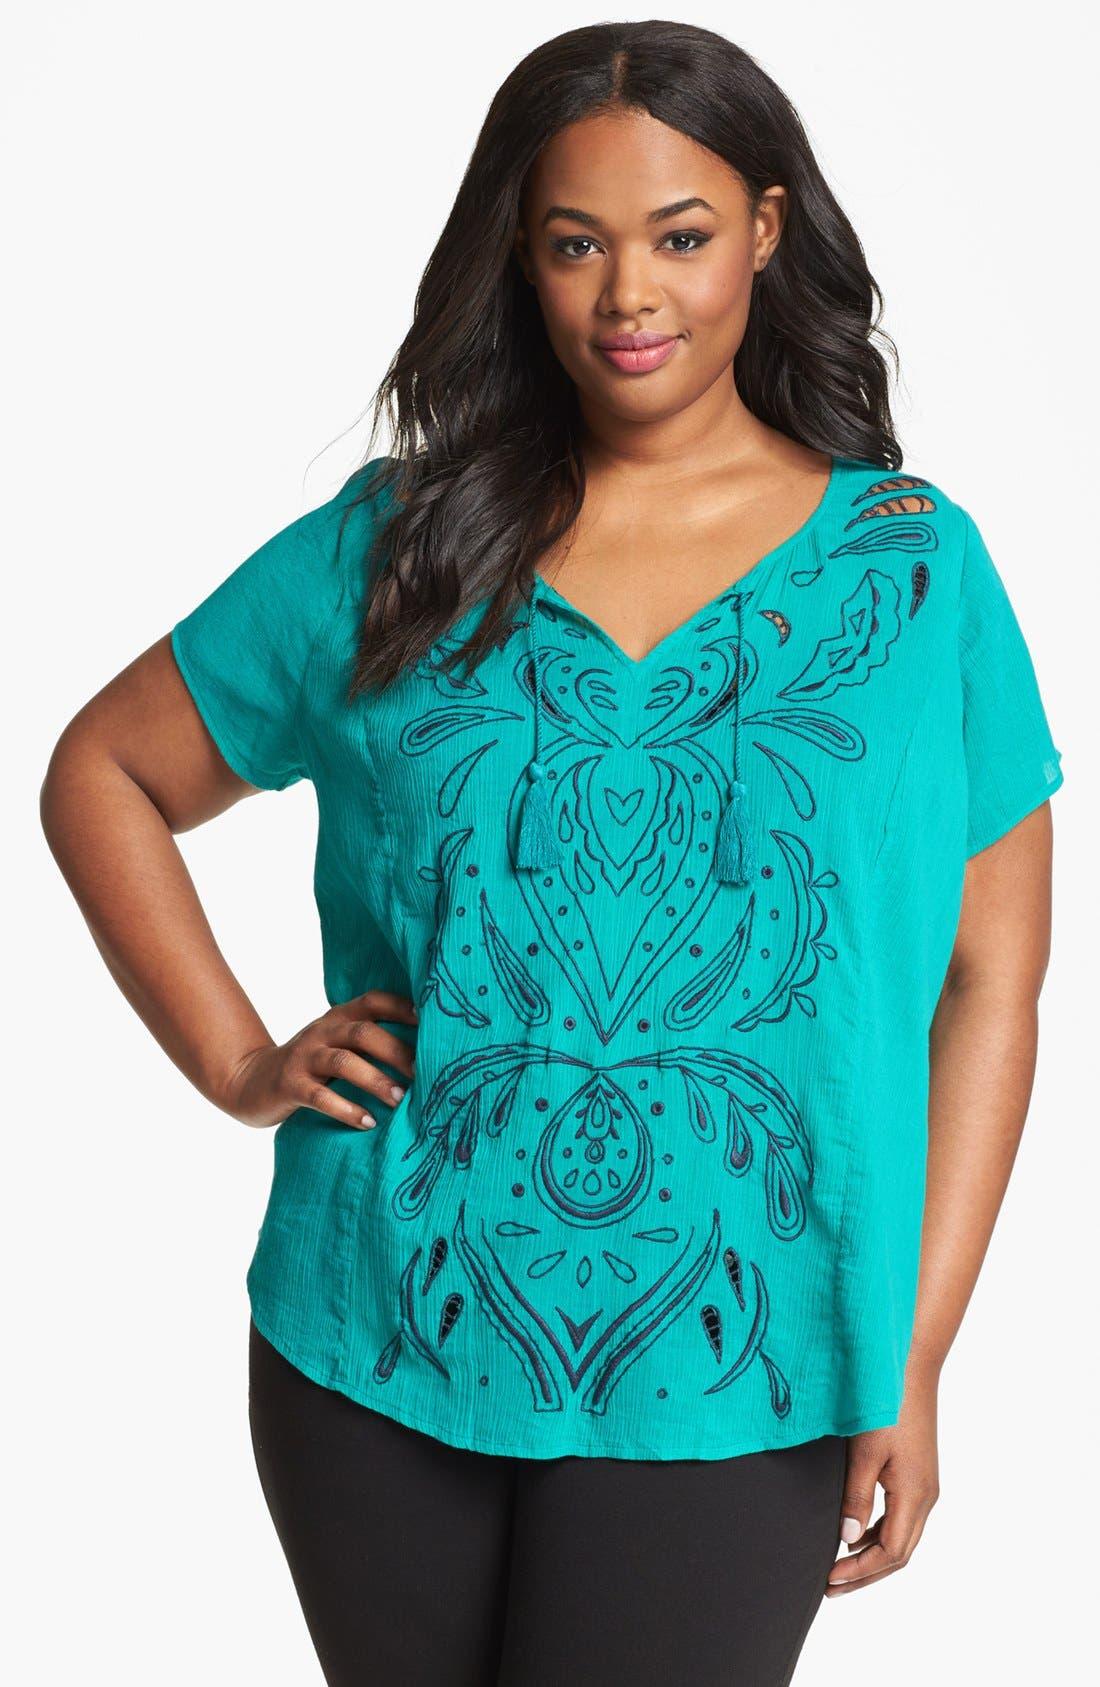 Main Image - Lucky Brand 'Juniper' Contrast Thread Cotton Top (Plus Size)